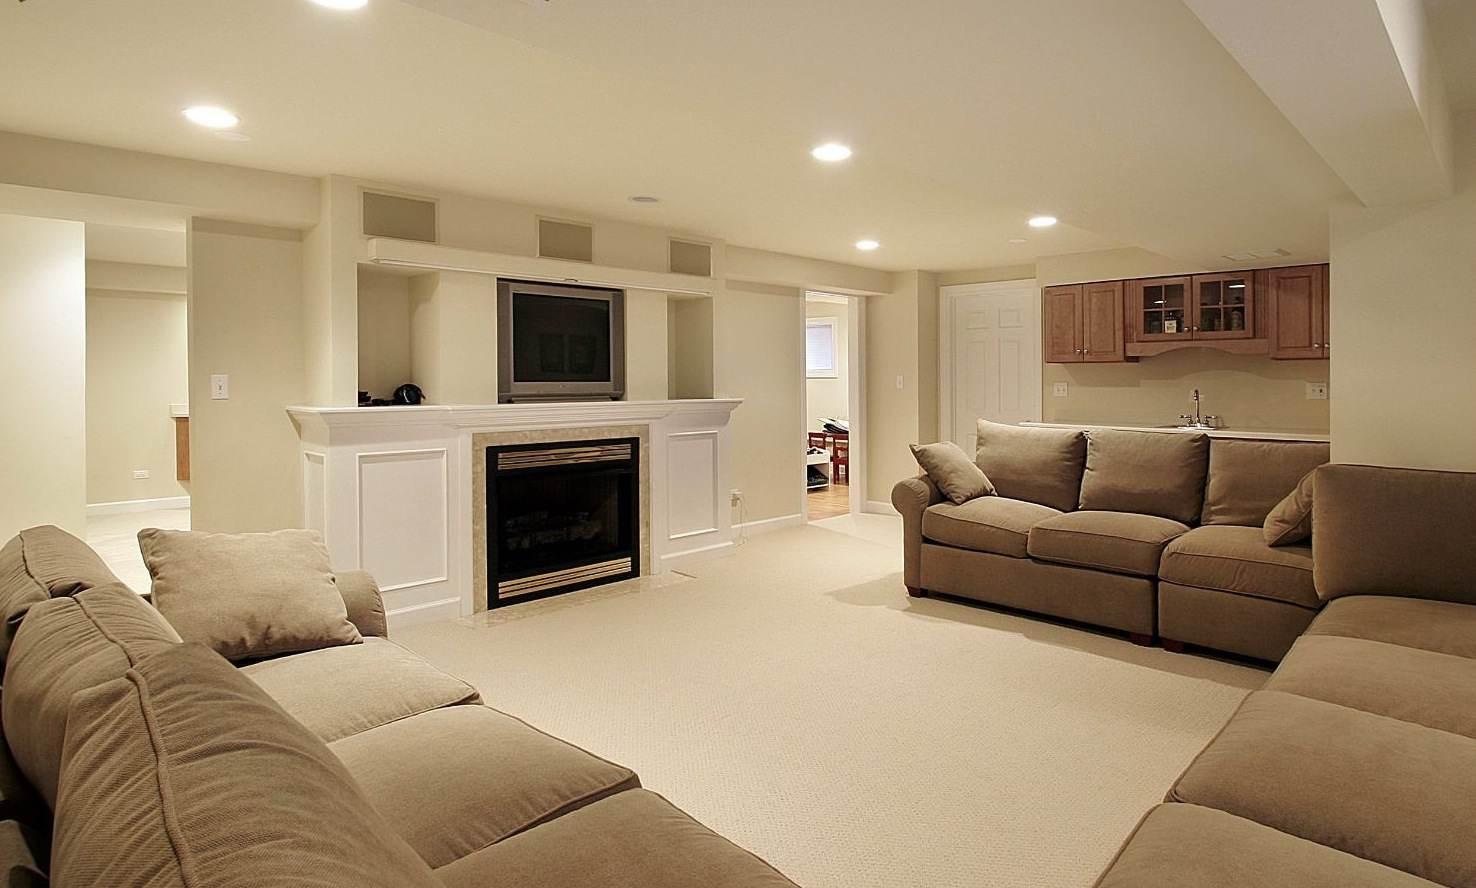 Best Color For Basement Walls